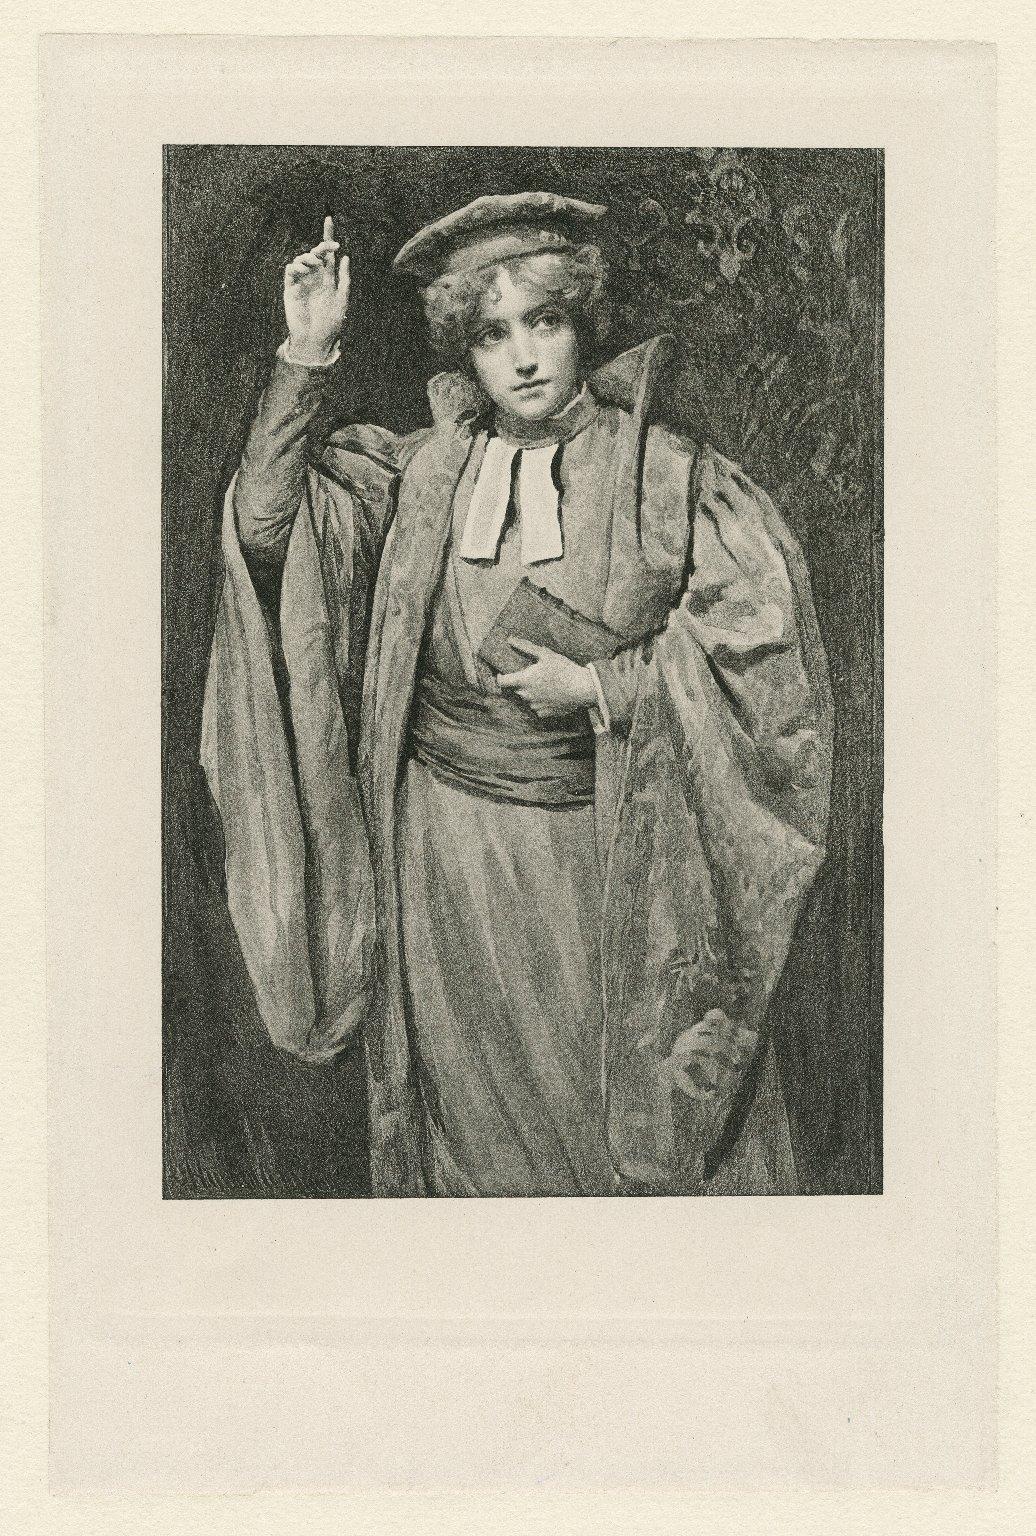 [Ellen Terry as Portia, in Shakespeare's Merchant of Venice] [graphic] / Harold Copping.